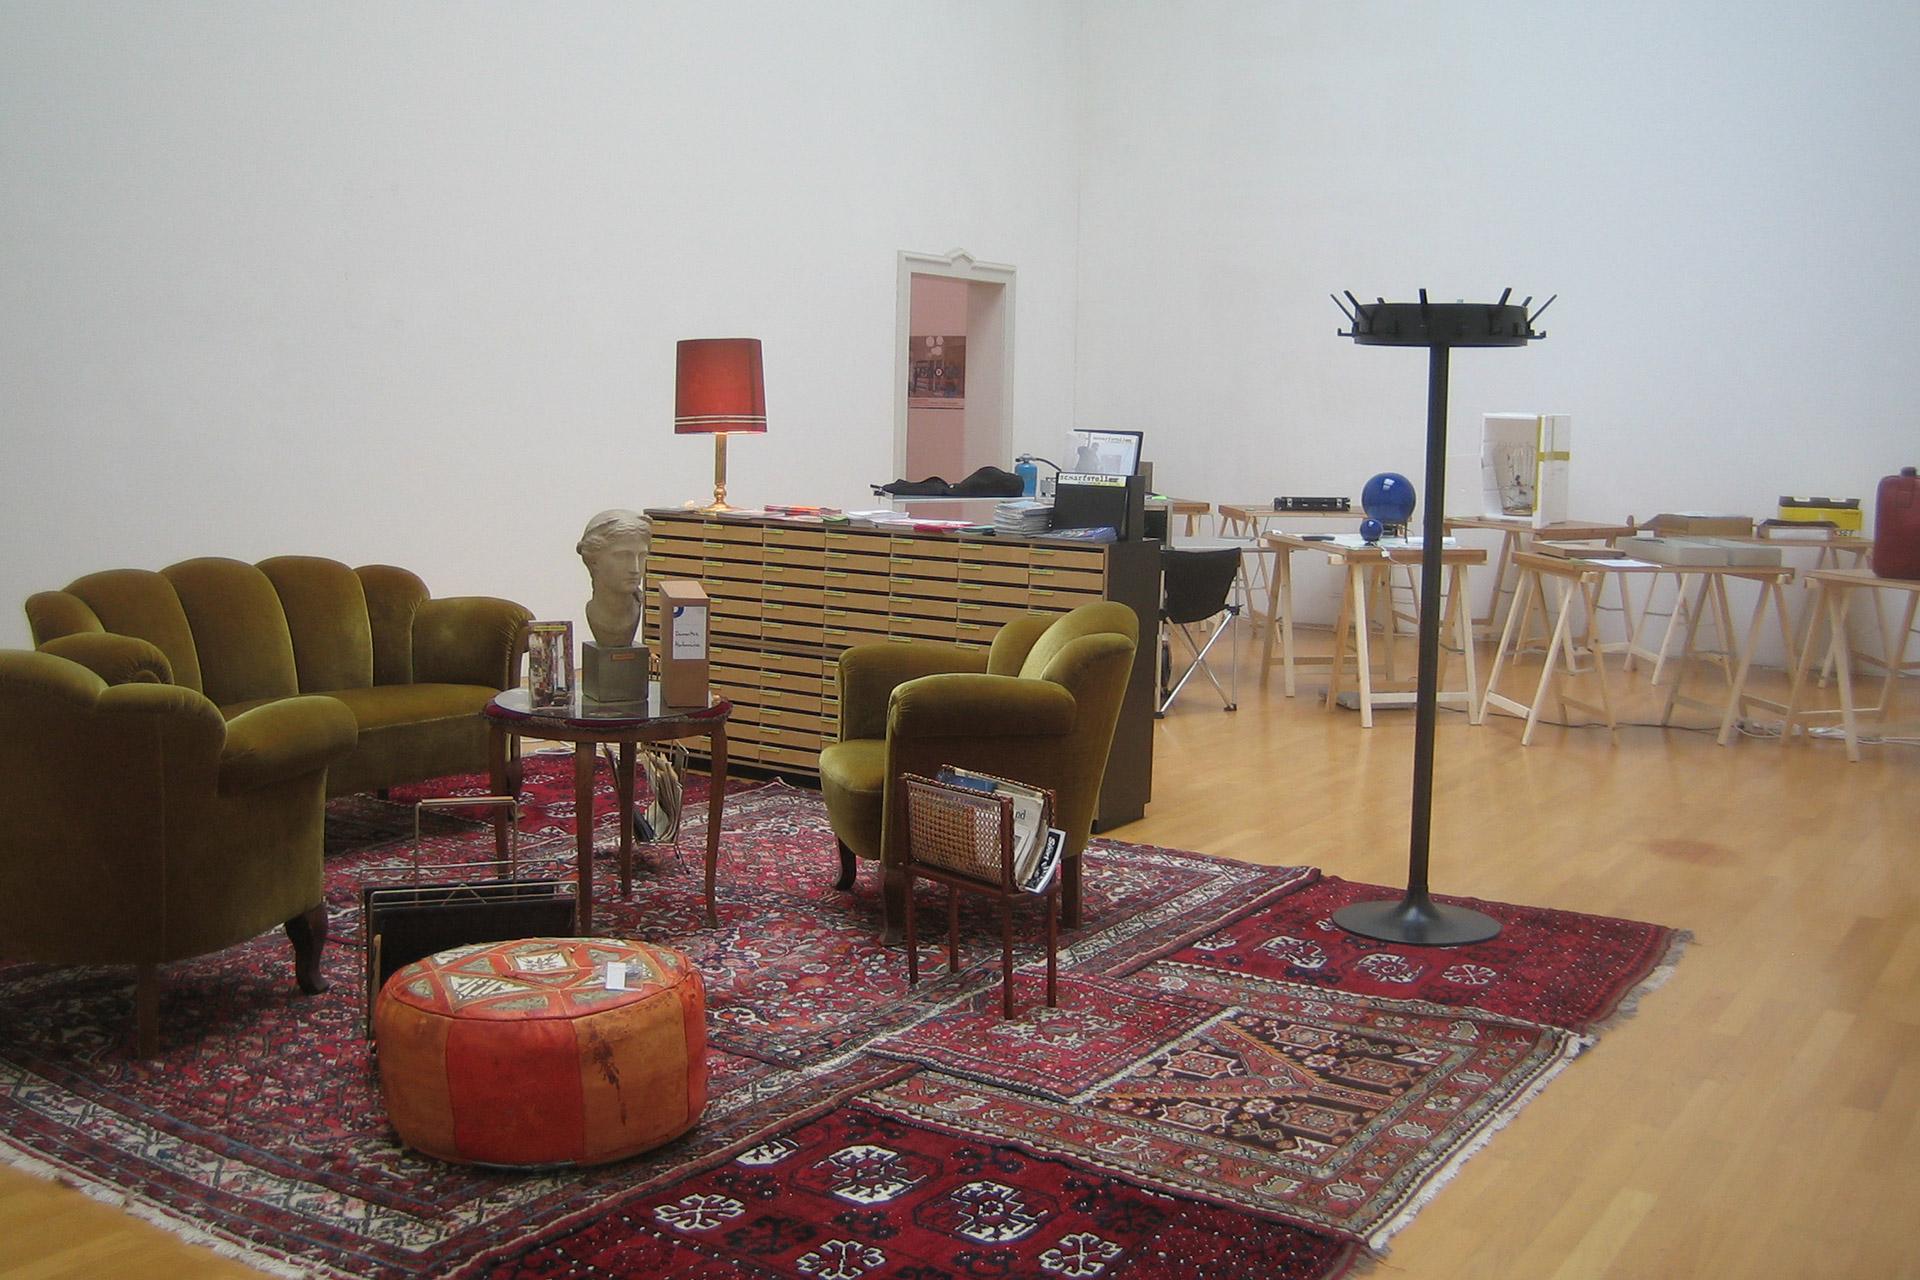 Werk-Dokumentation-Kunsthalle-Winterthur-2007-2.jpg